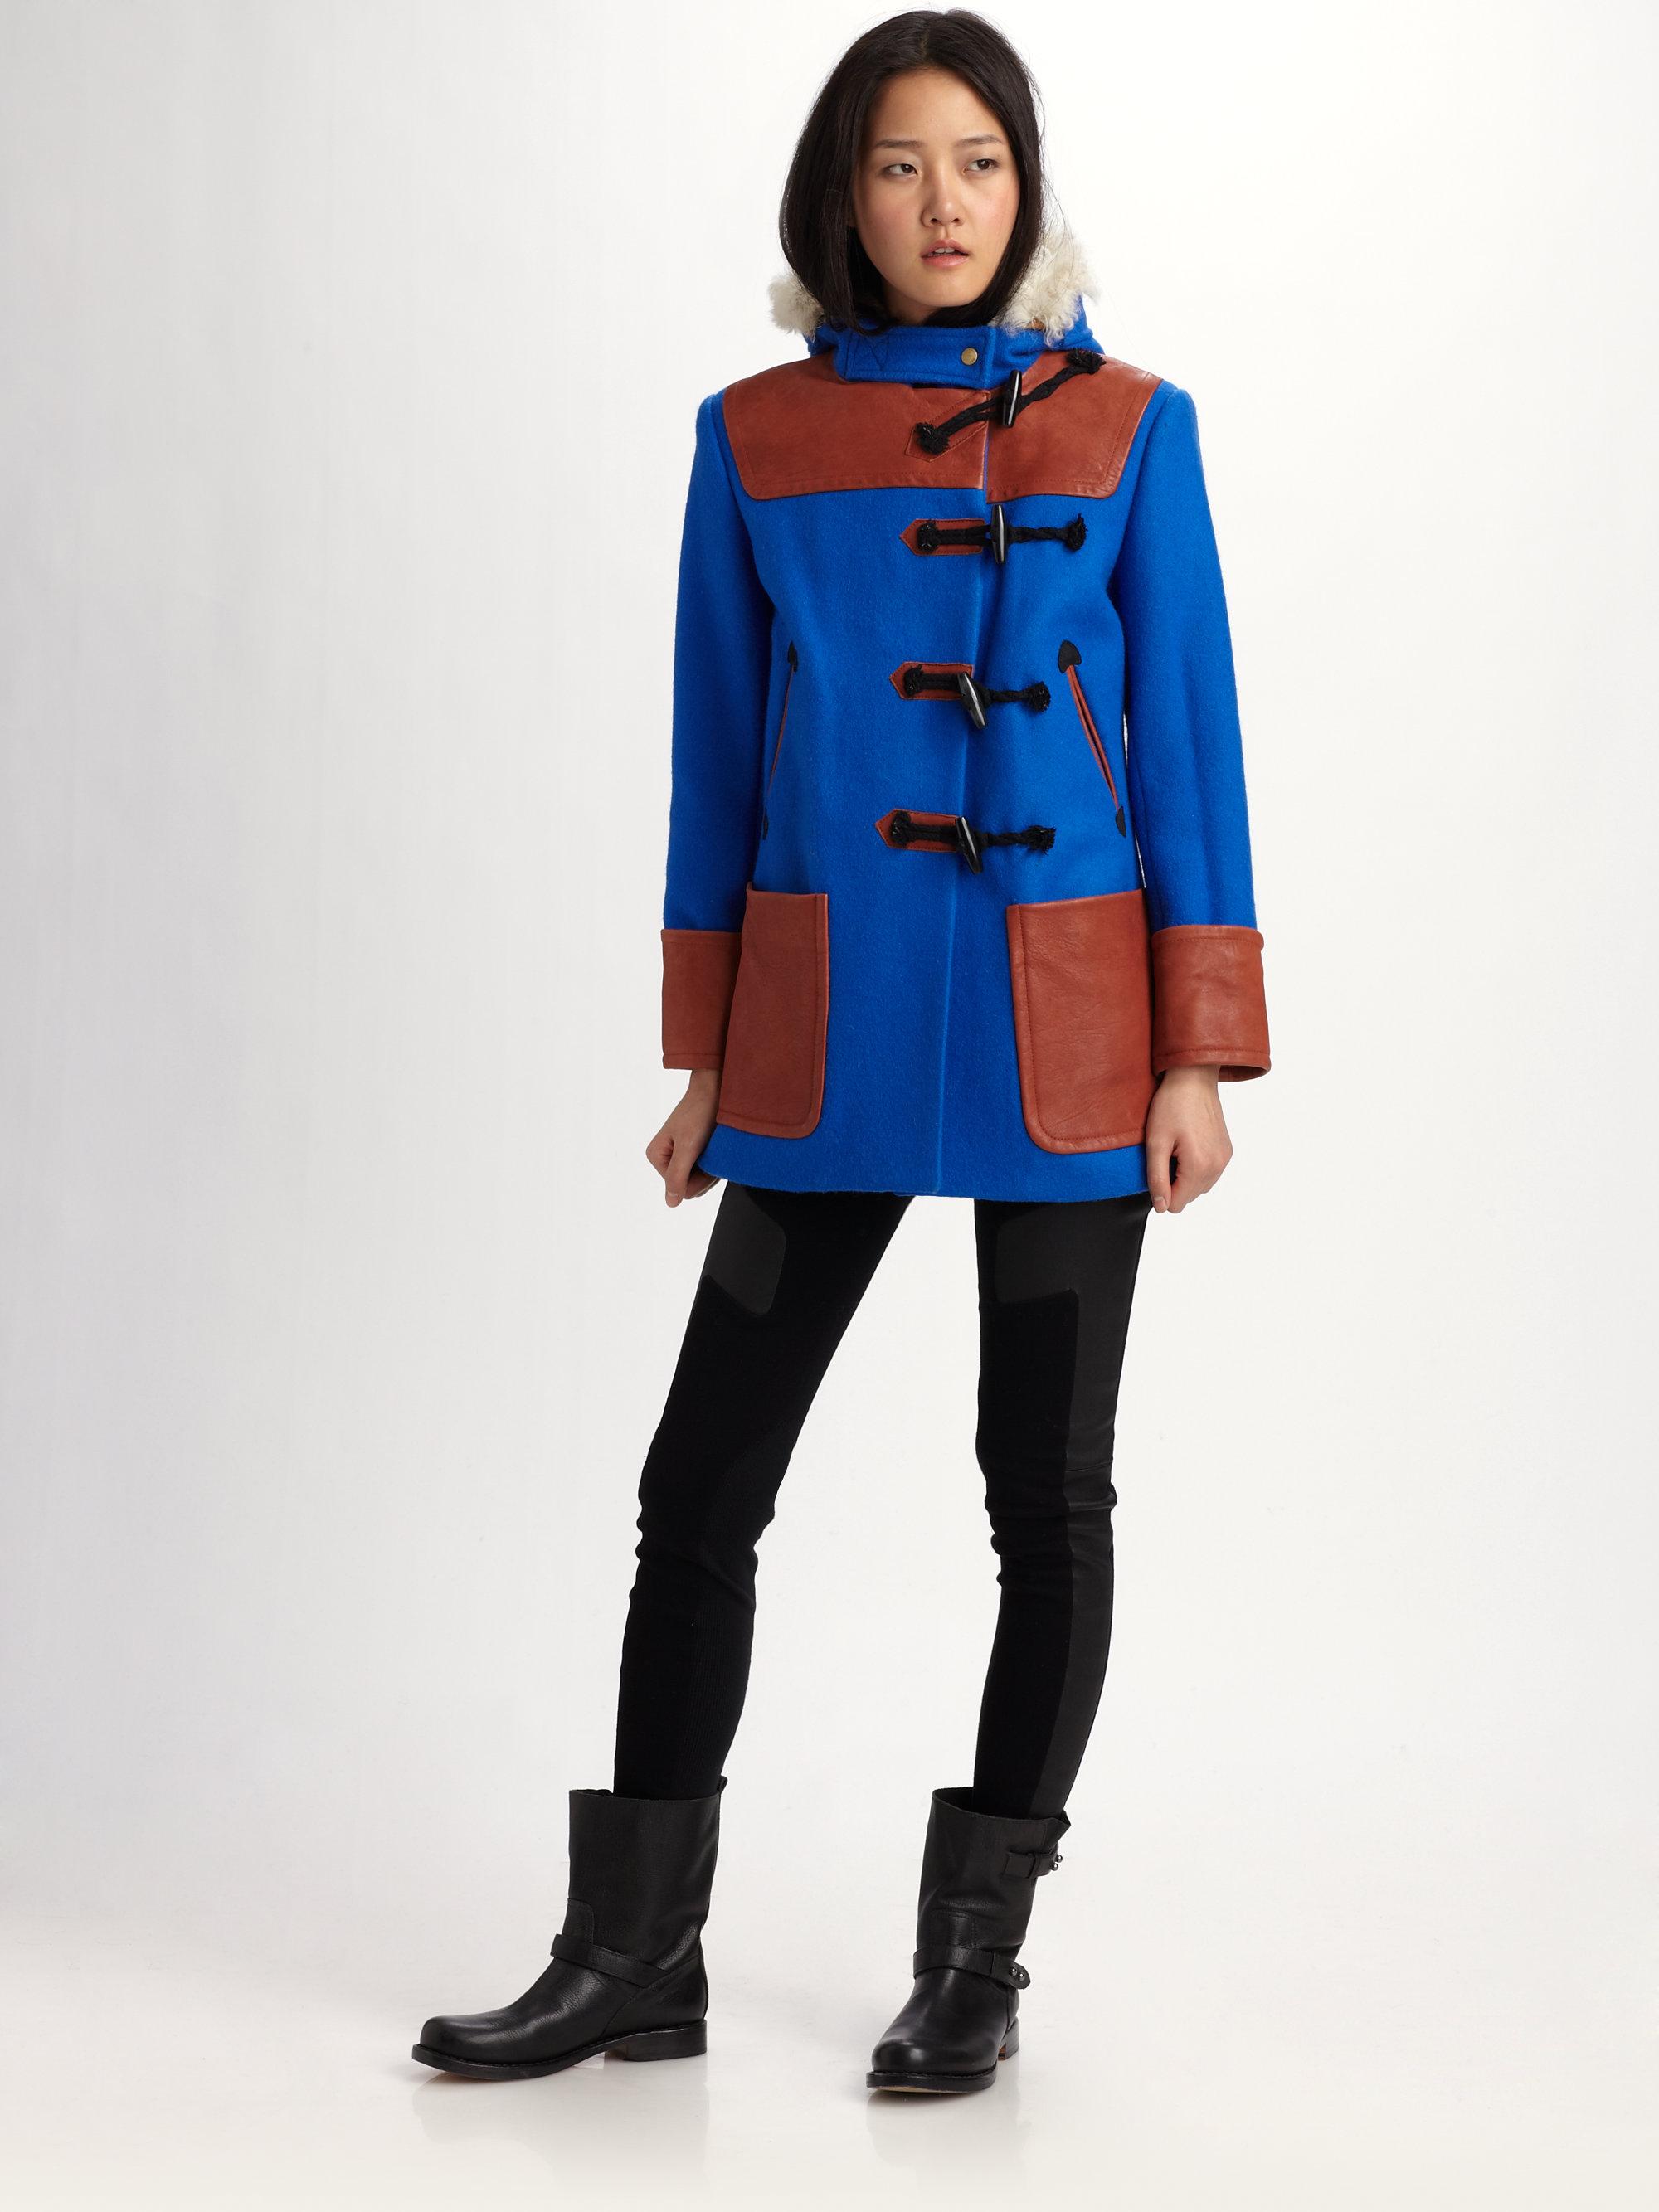 Rag & bone Duffle Coat in Blue | Lyst